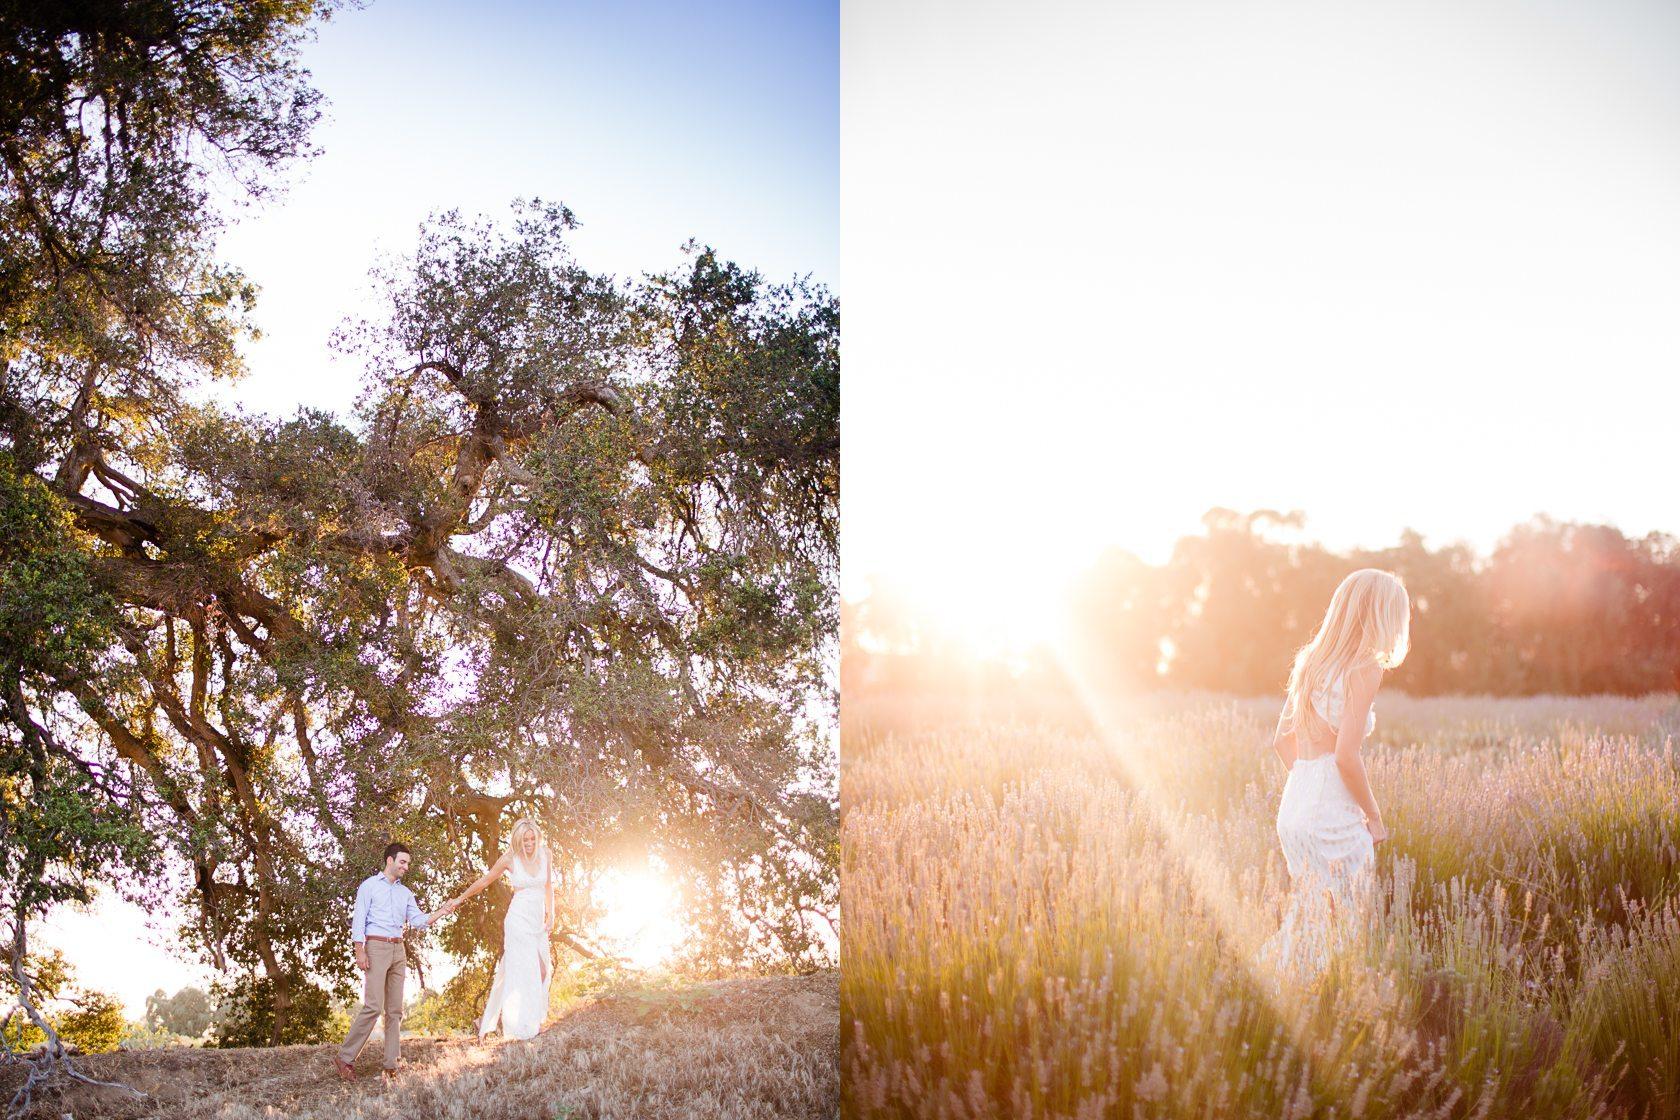 Highland_Springs_Lavender_Field_Engagement_09.jpg